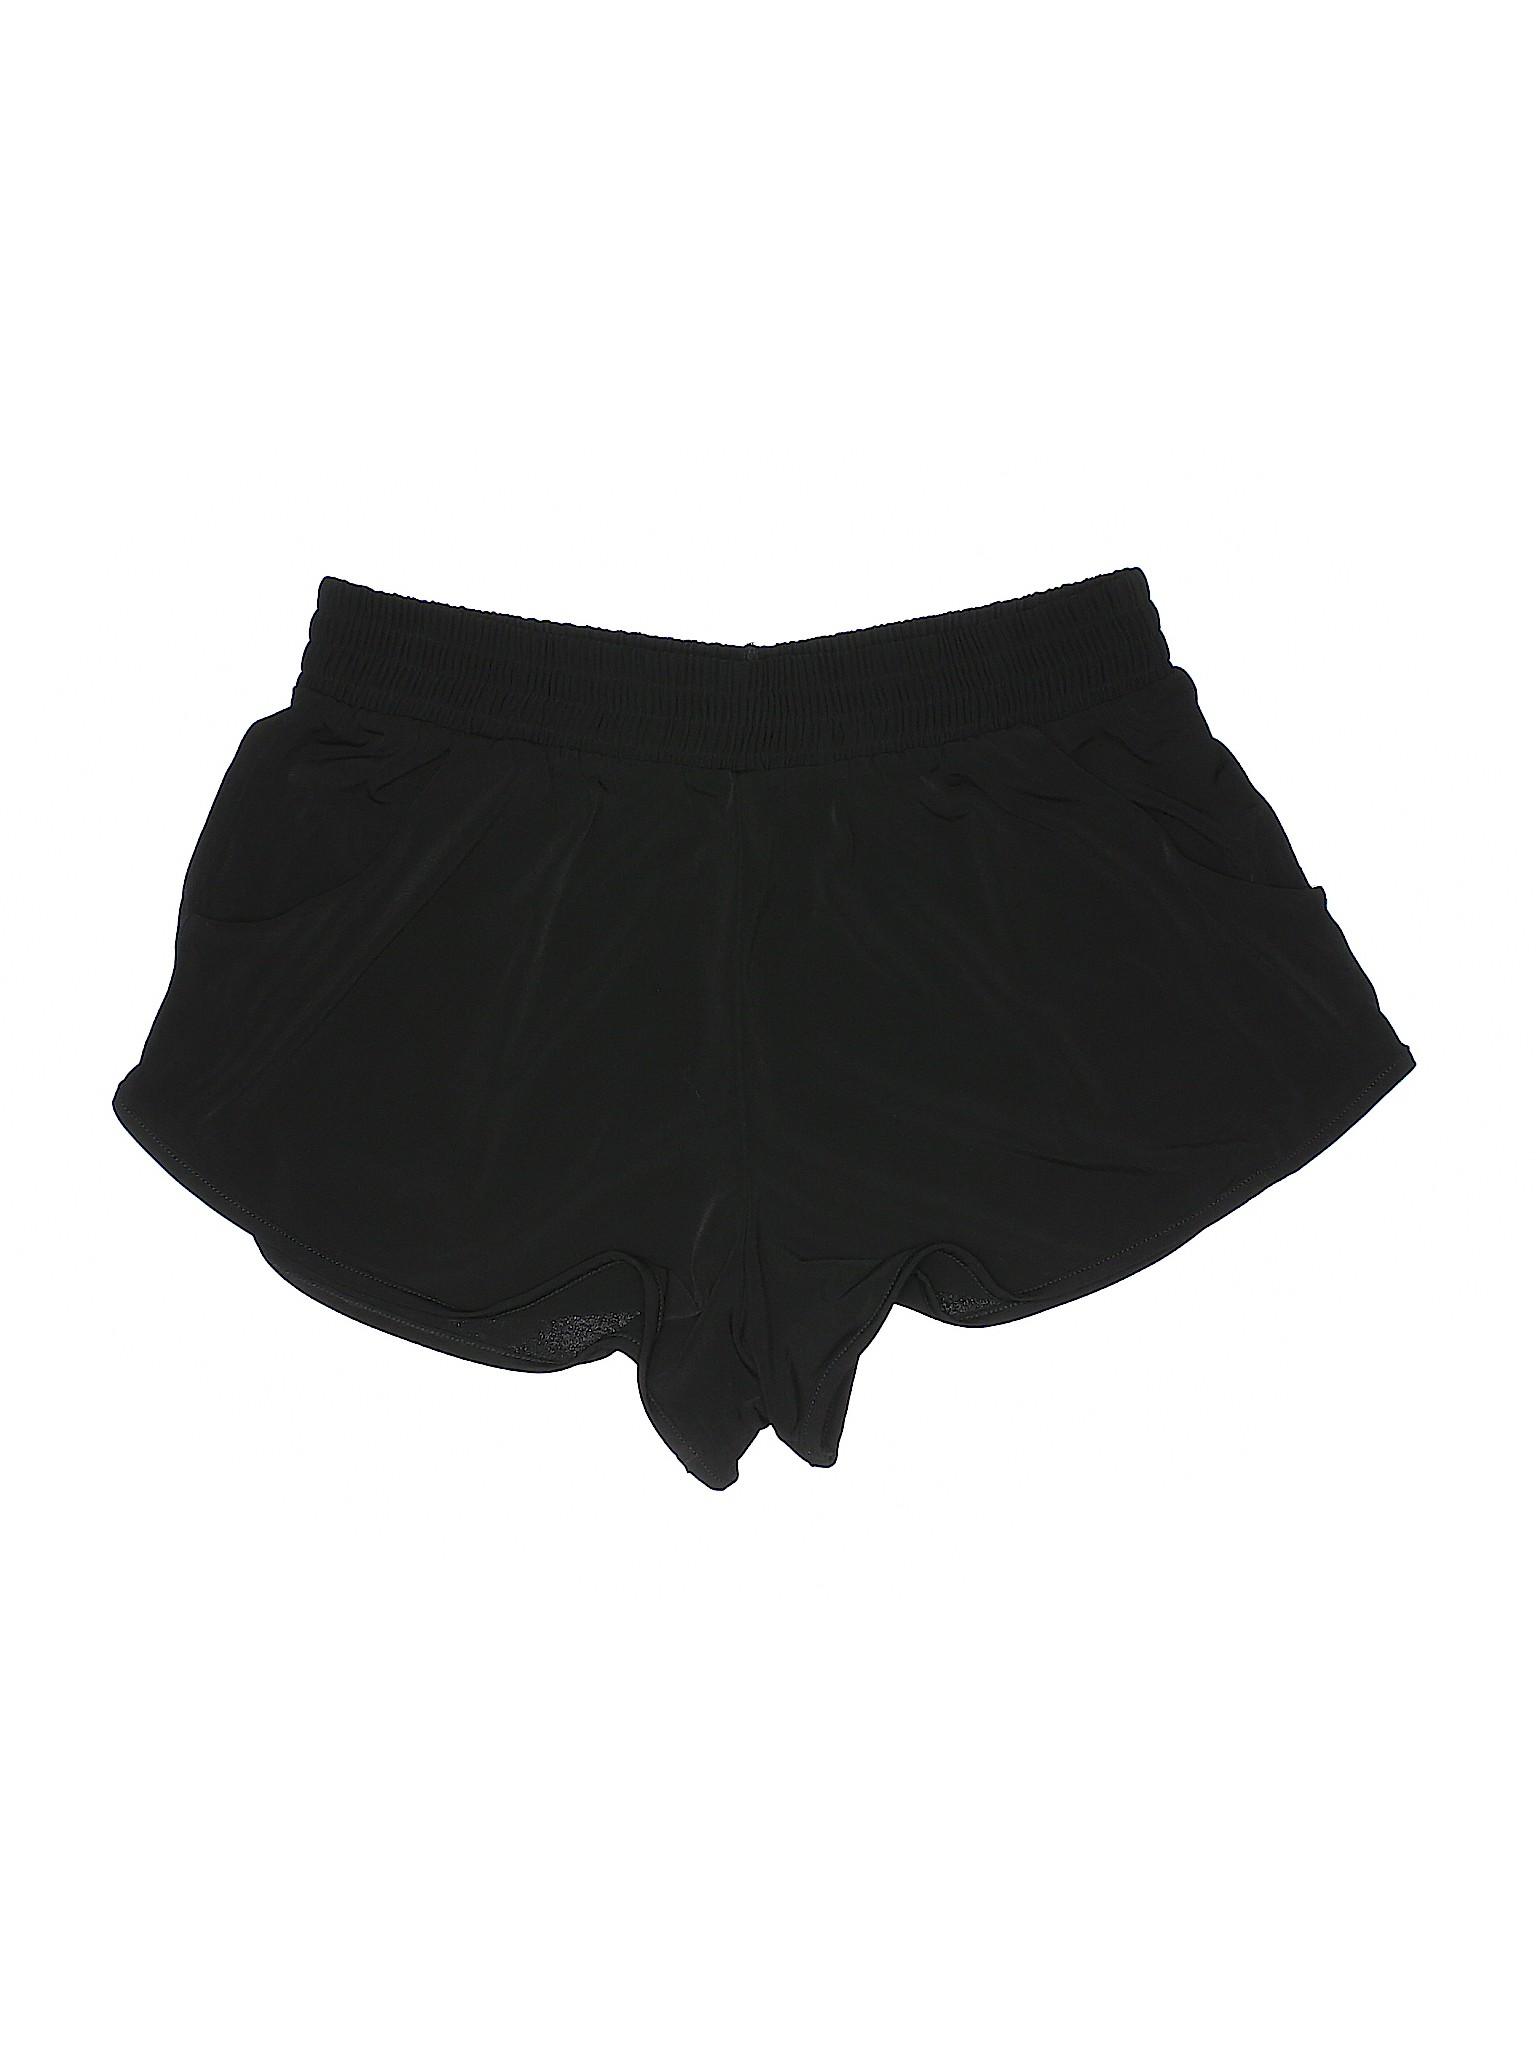 Onzie Onzie Boutique Boutique Onzie Shorts Boutique Shorts Boutique Shorts Onzie Shorts qAcBwIWd